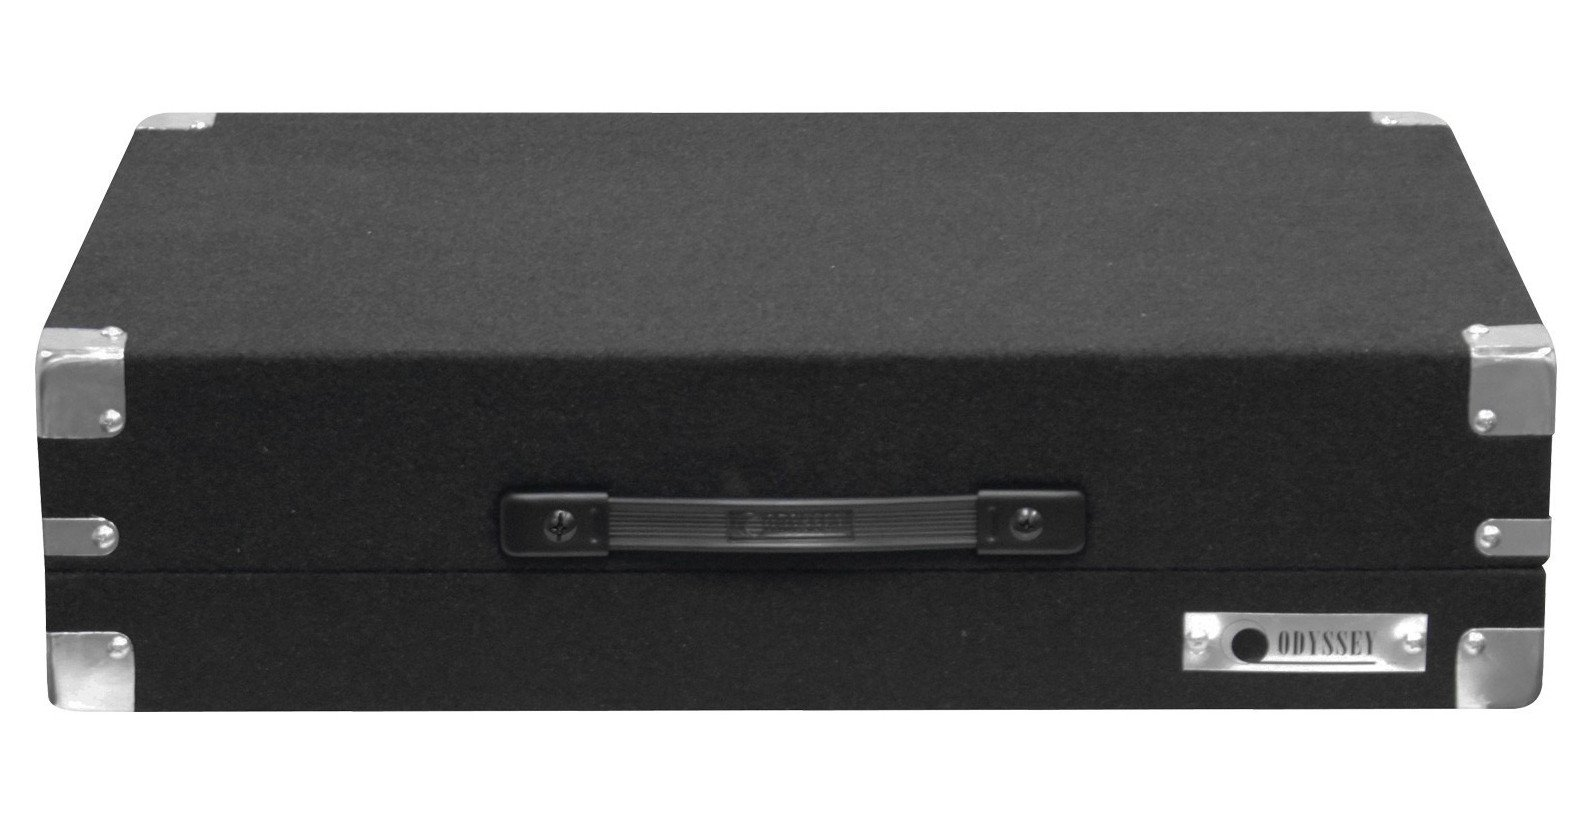 Pioneer DDJ-SR DJ Controller Carpeted Case